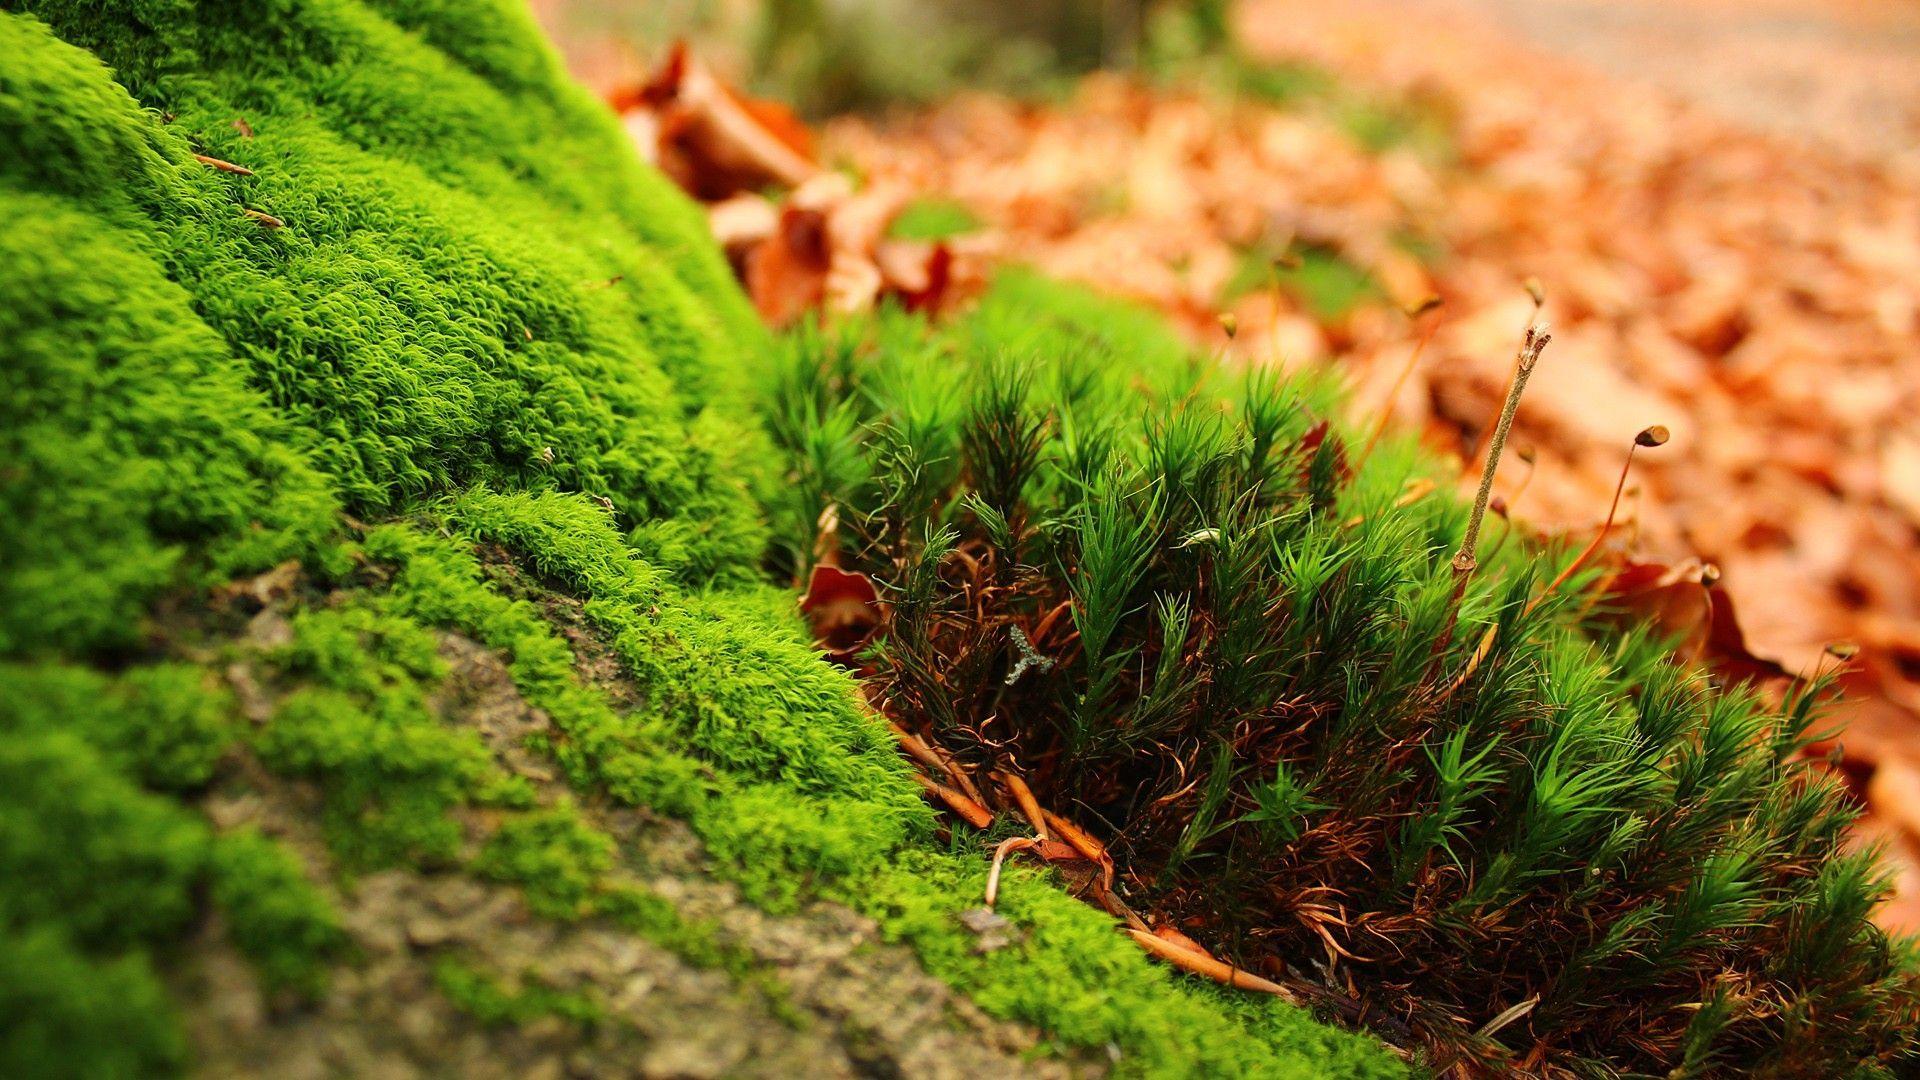 Greenish Need Iphone 6s Plus Wallpaper Background - Nature Ultra Hd Wallpapers 8k - HD Wallpaper